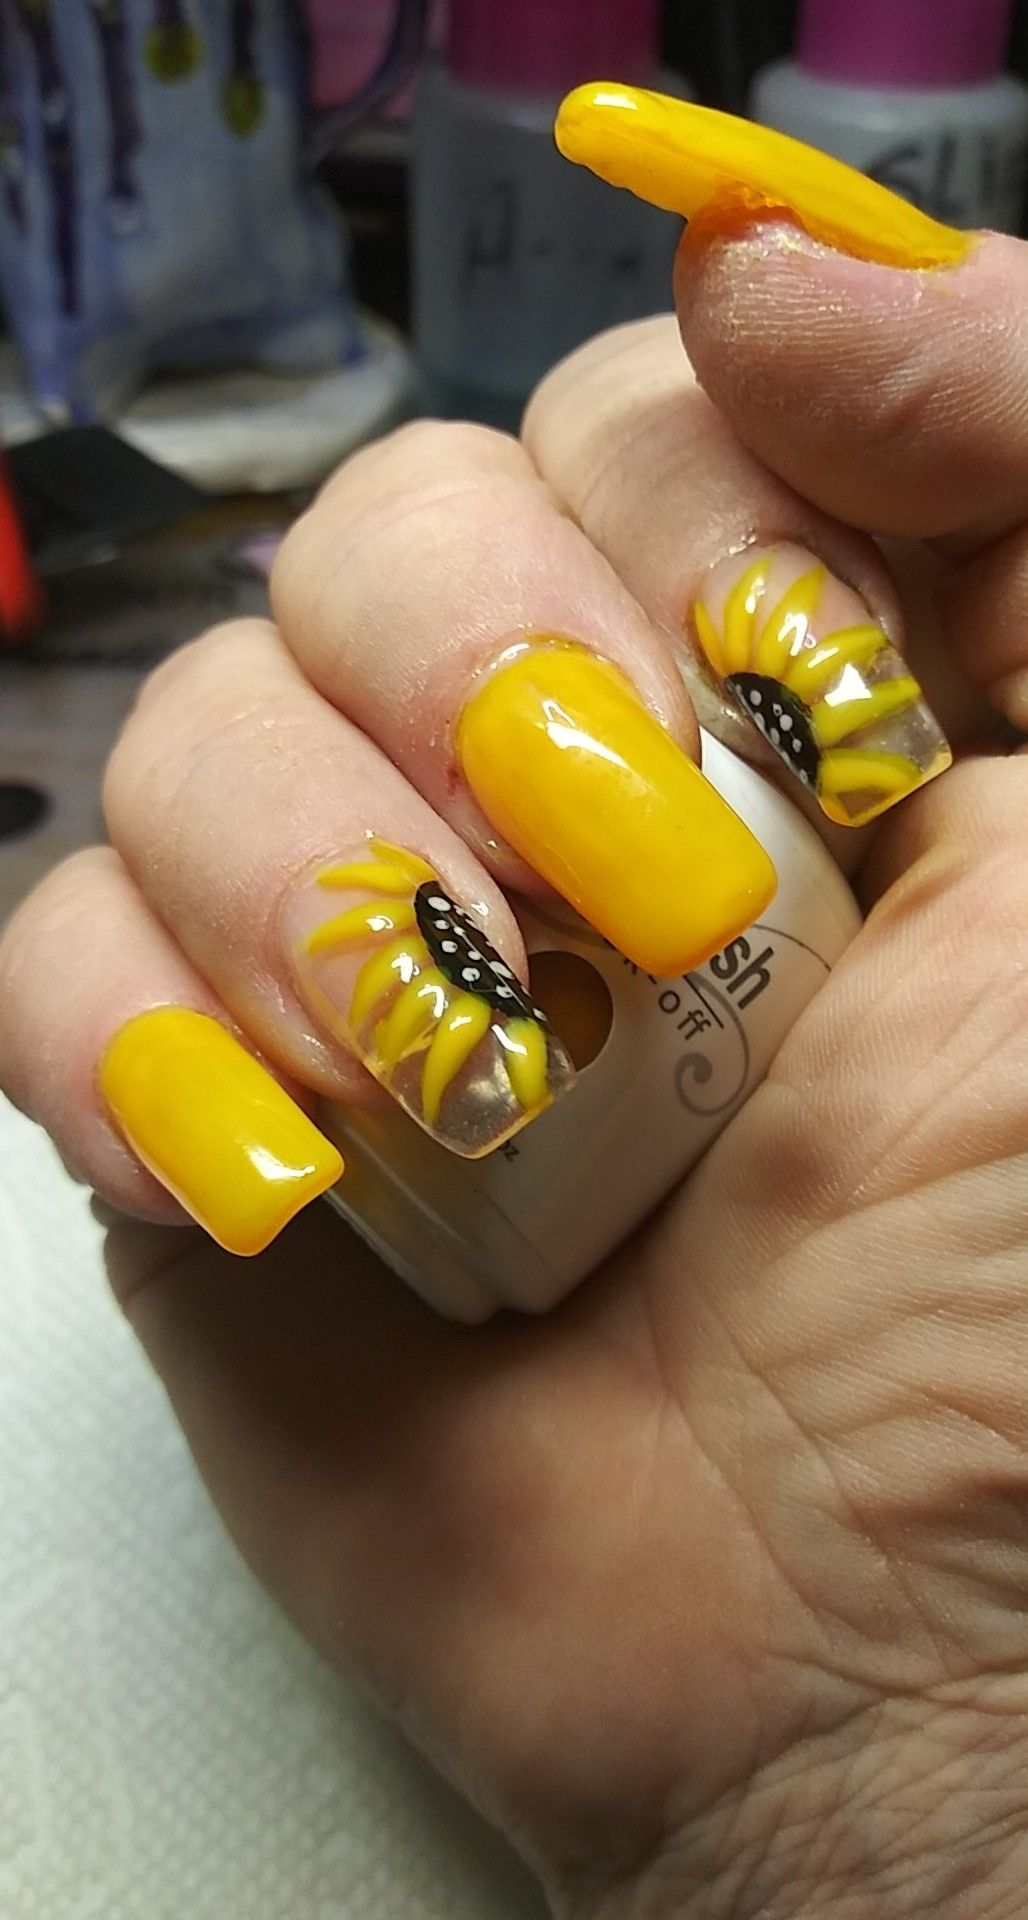 Sunflower nails ☀️ 🌻 | Sunflower nails, Yellow acrylic